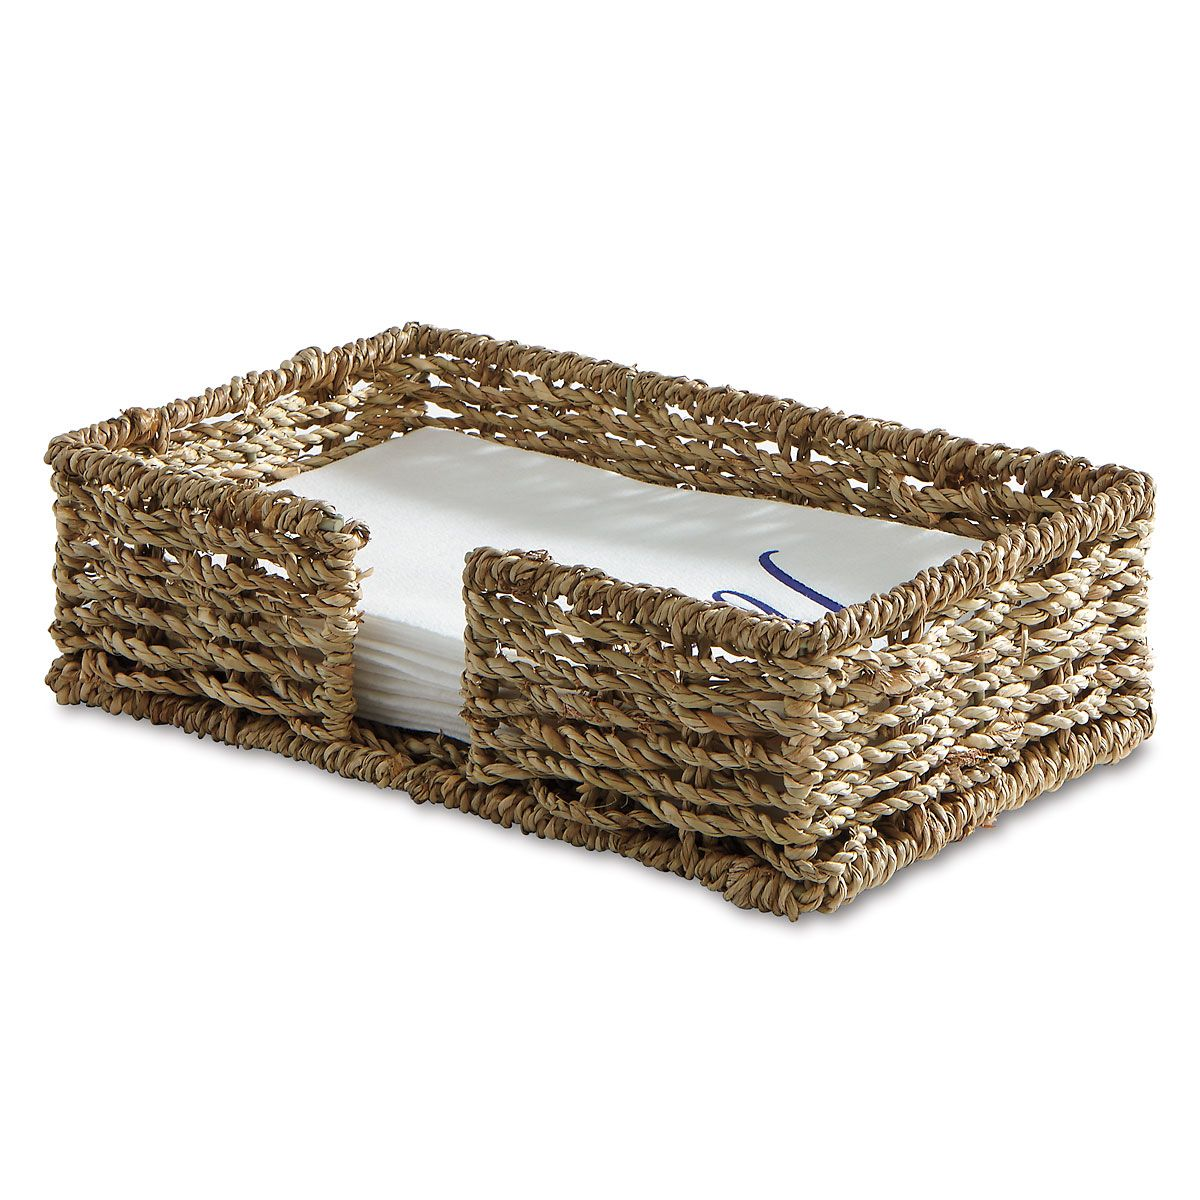 Sea Grass Guest Towel Napkin Holder